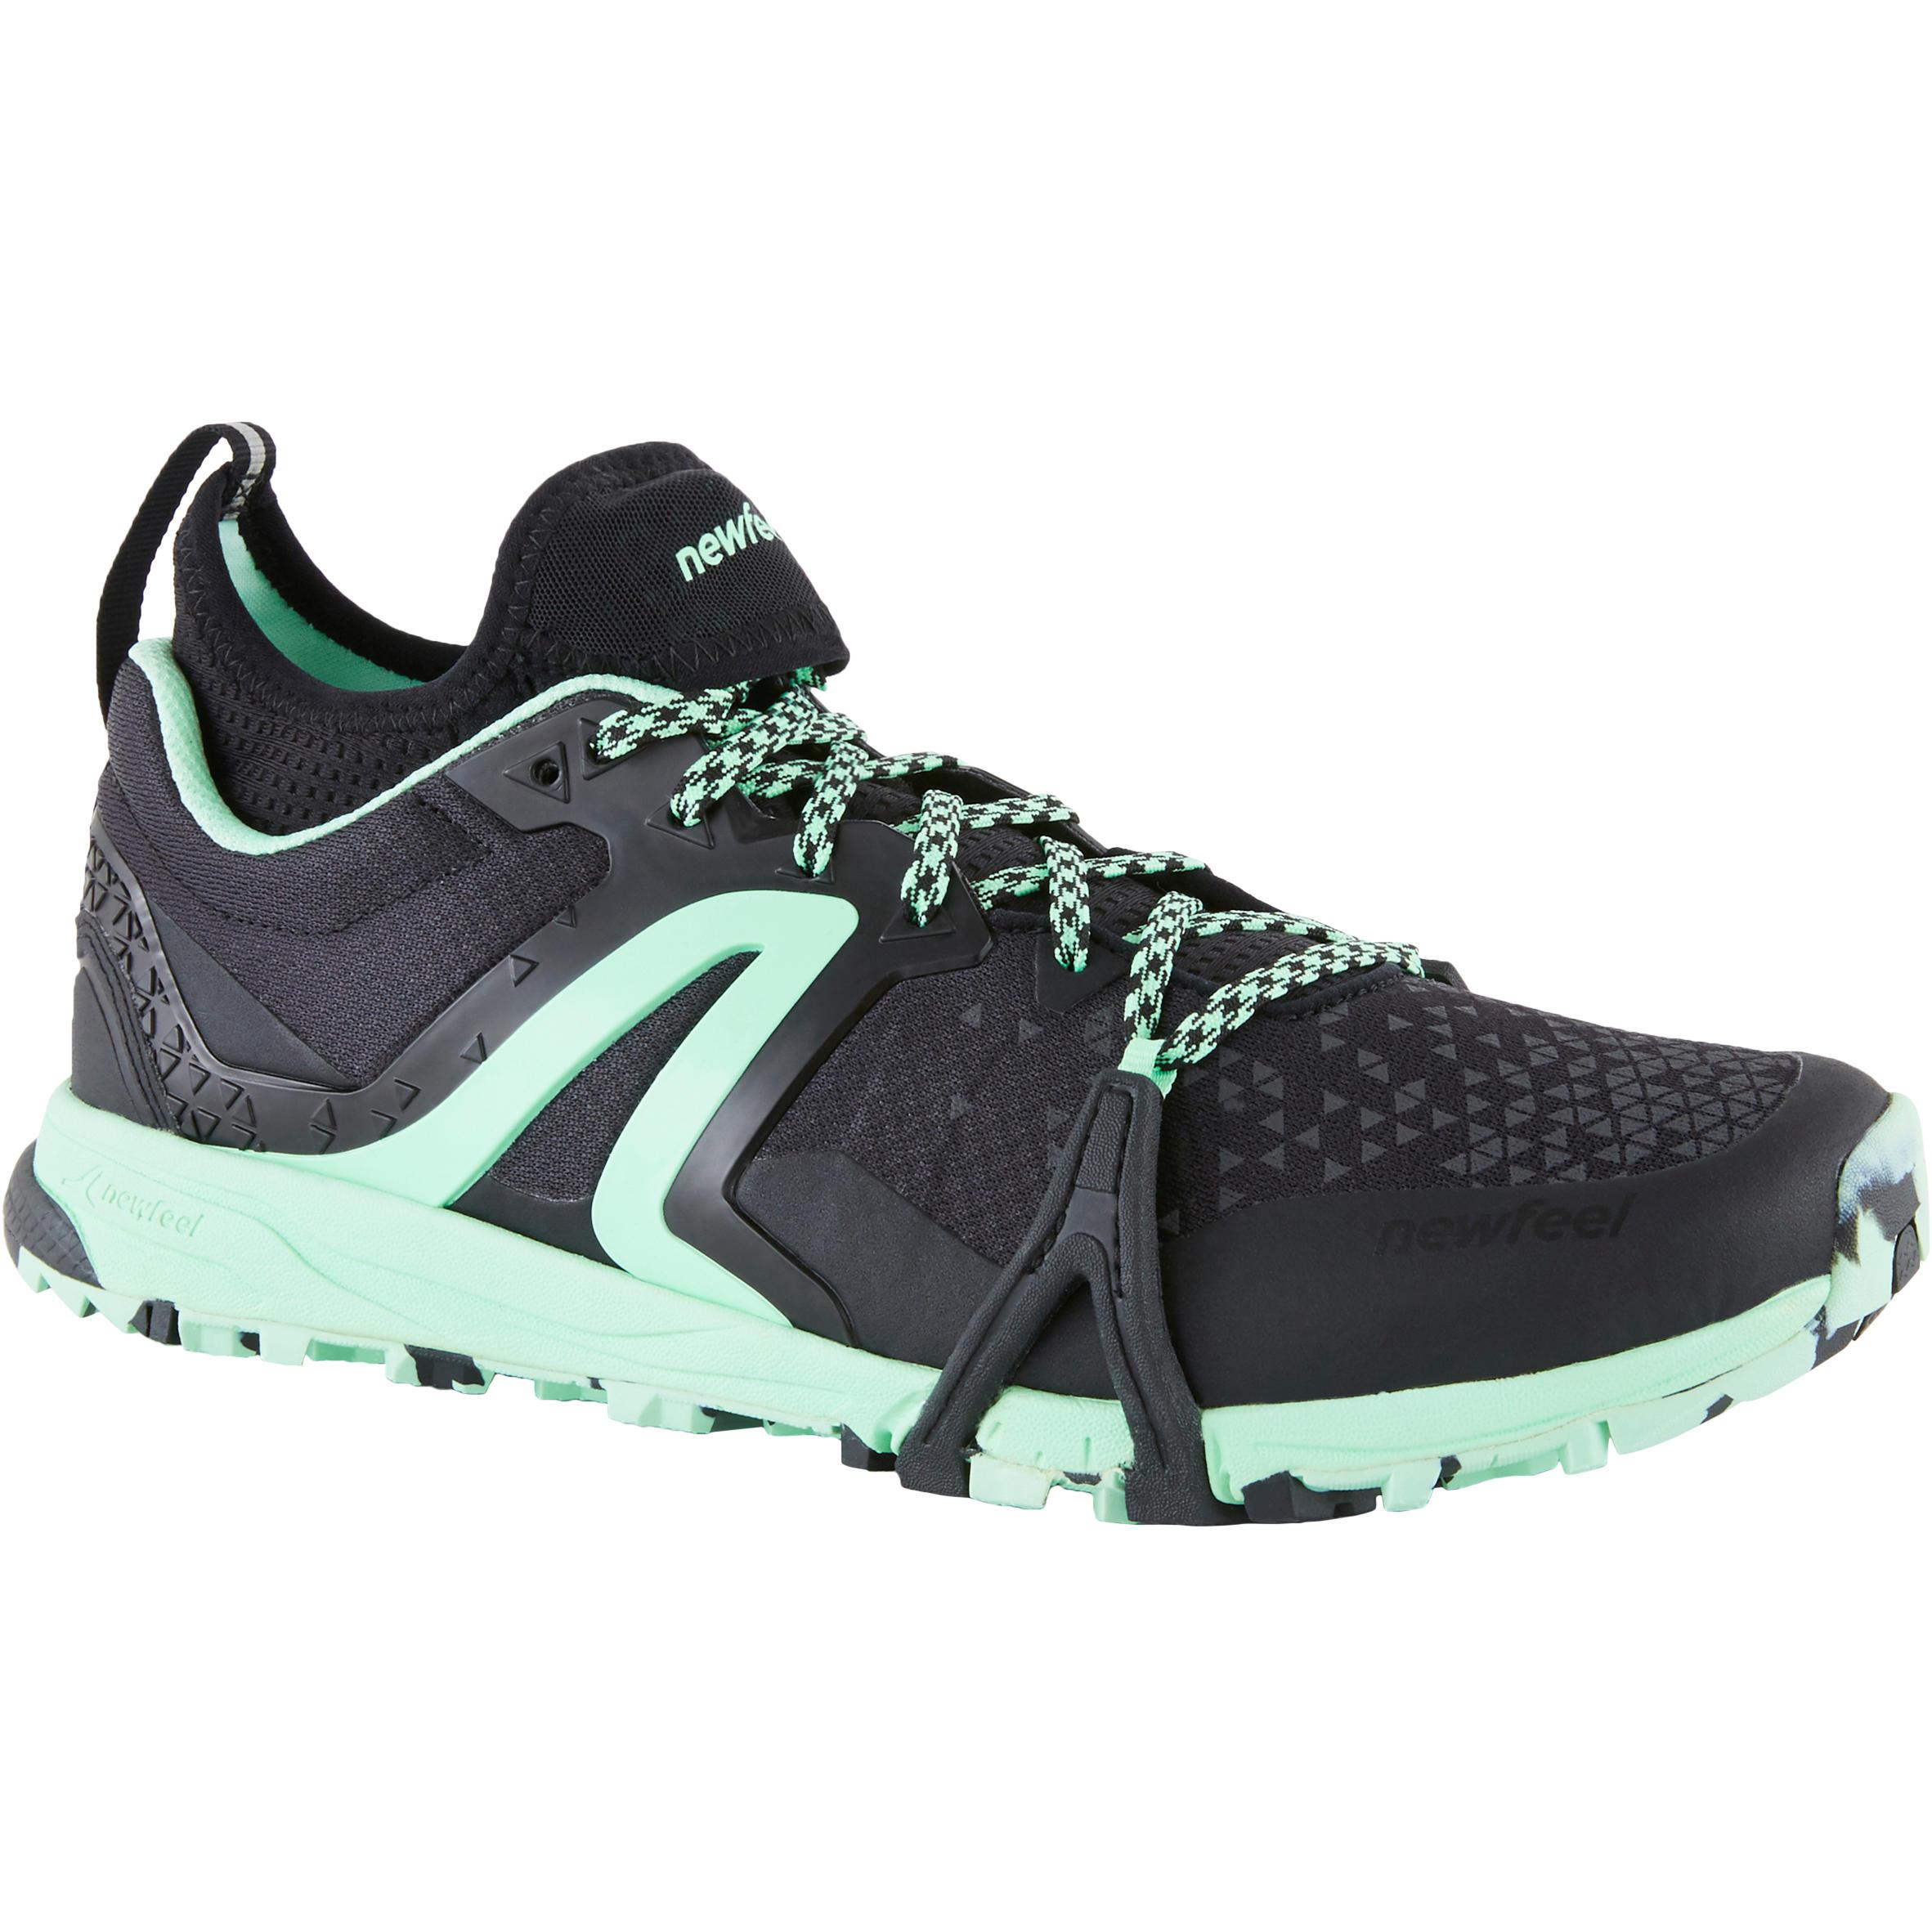 Chaussures de marche nordique NW 900 Flex-H vert / noir - Newfeel